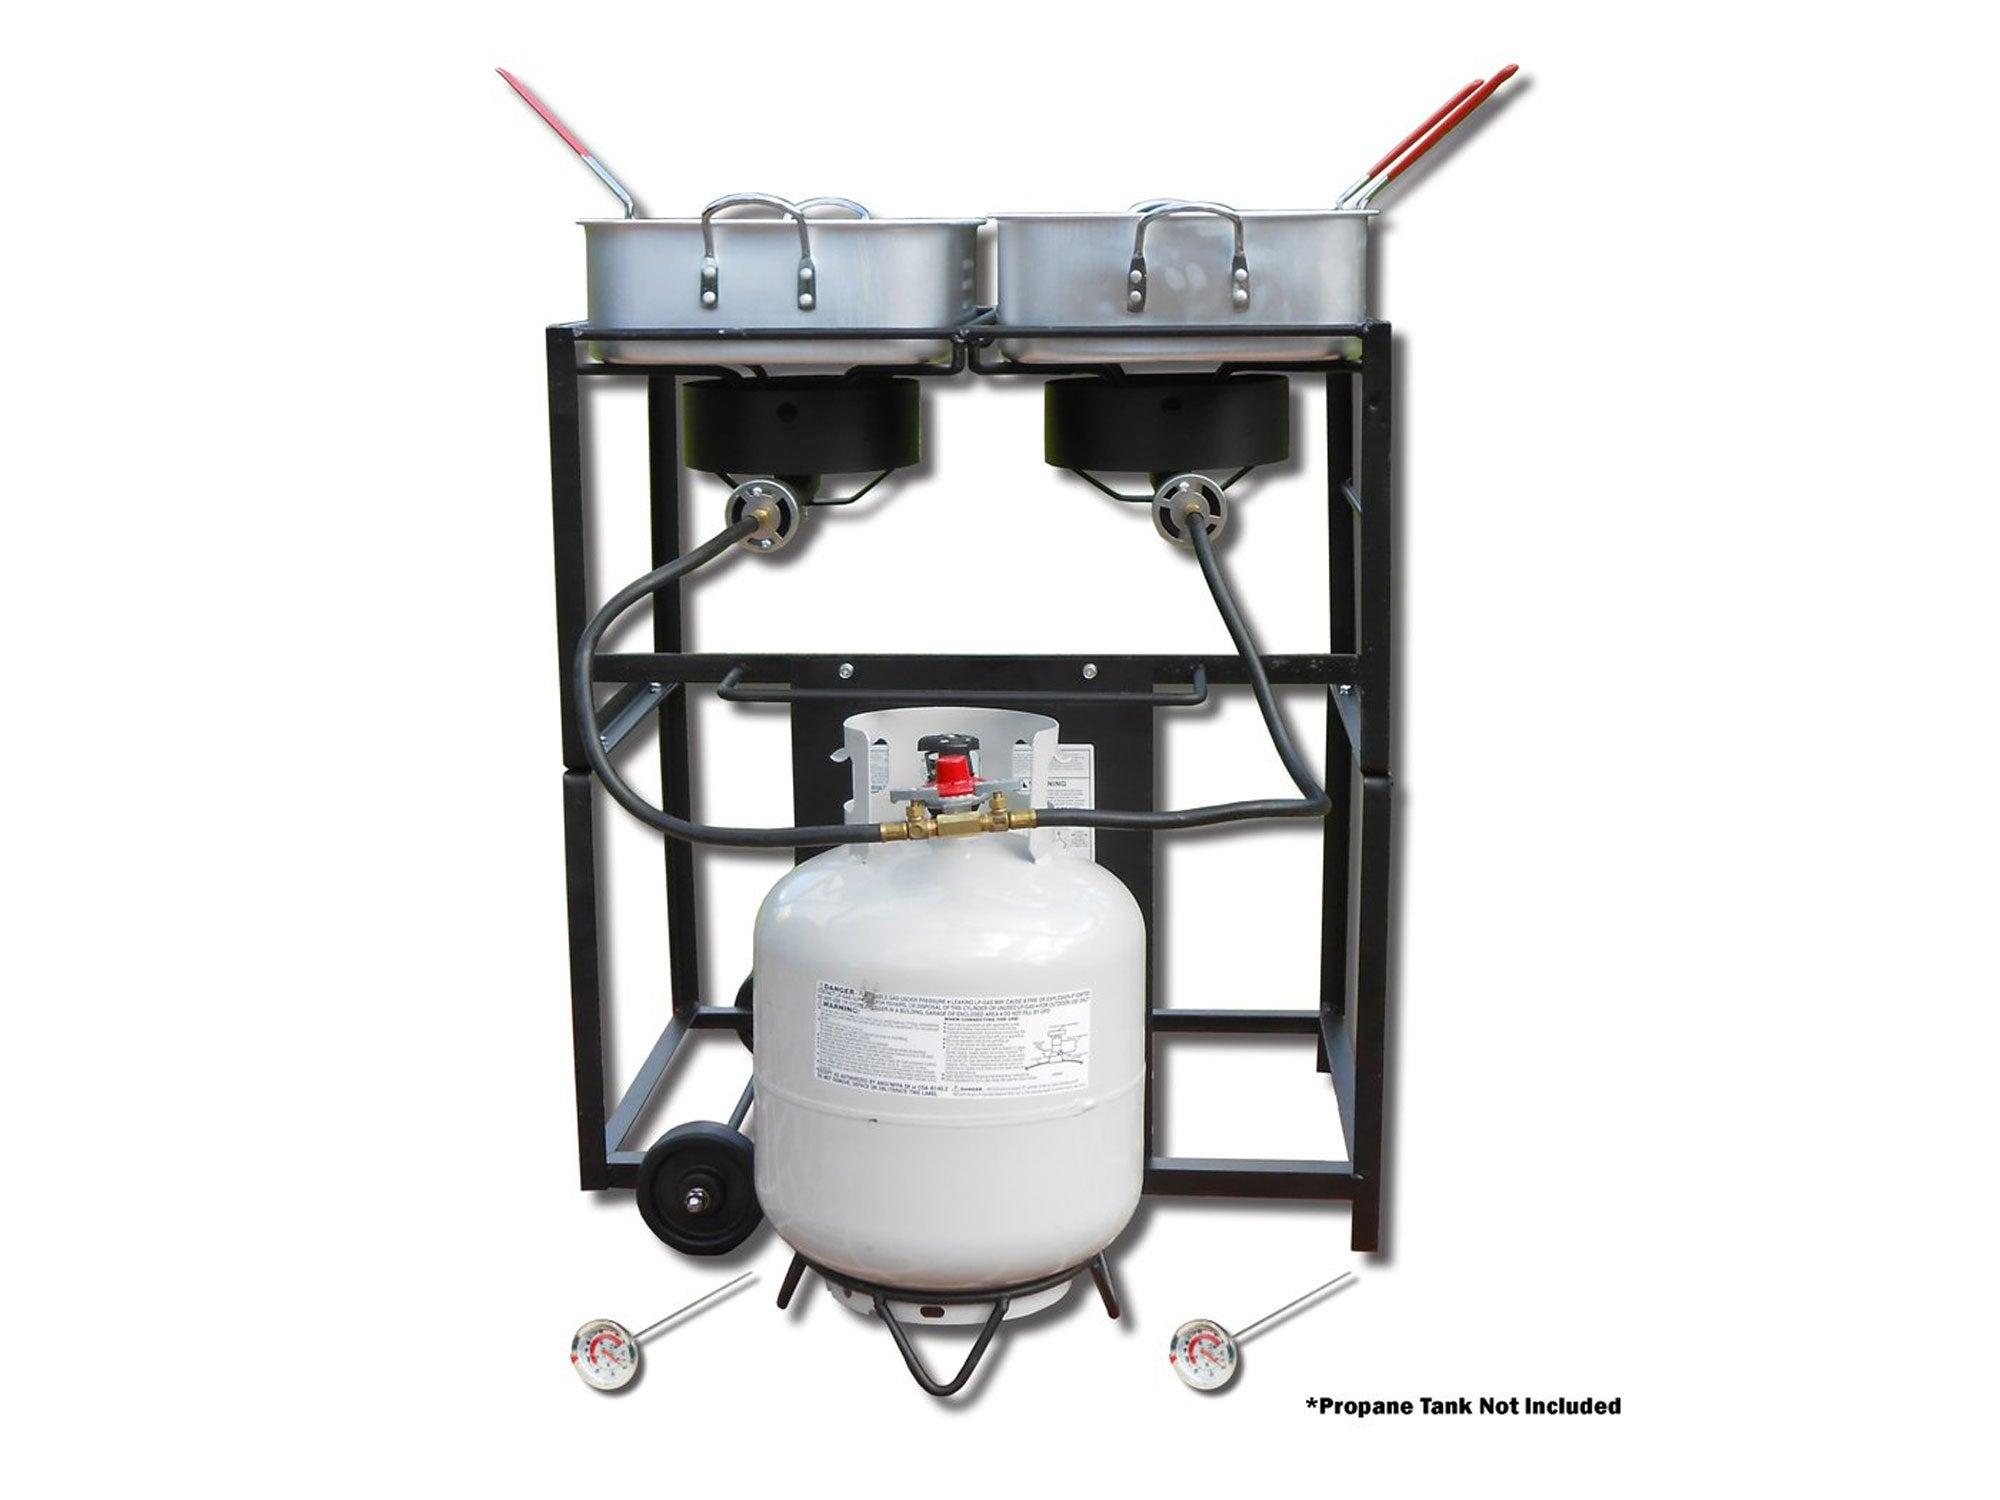 King Kooker 30-Inch Dual-Burner Outdoor Propane Frying Cart